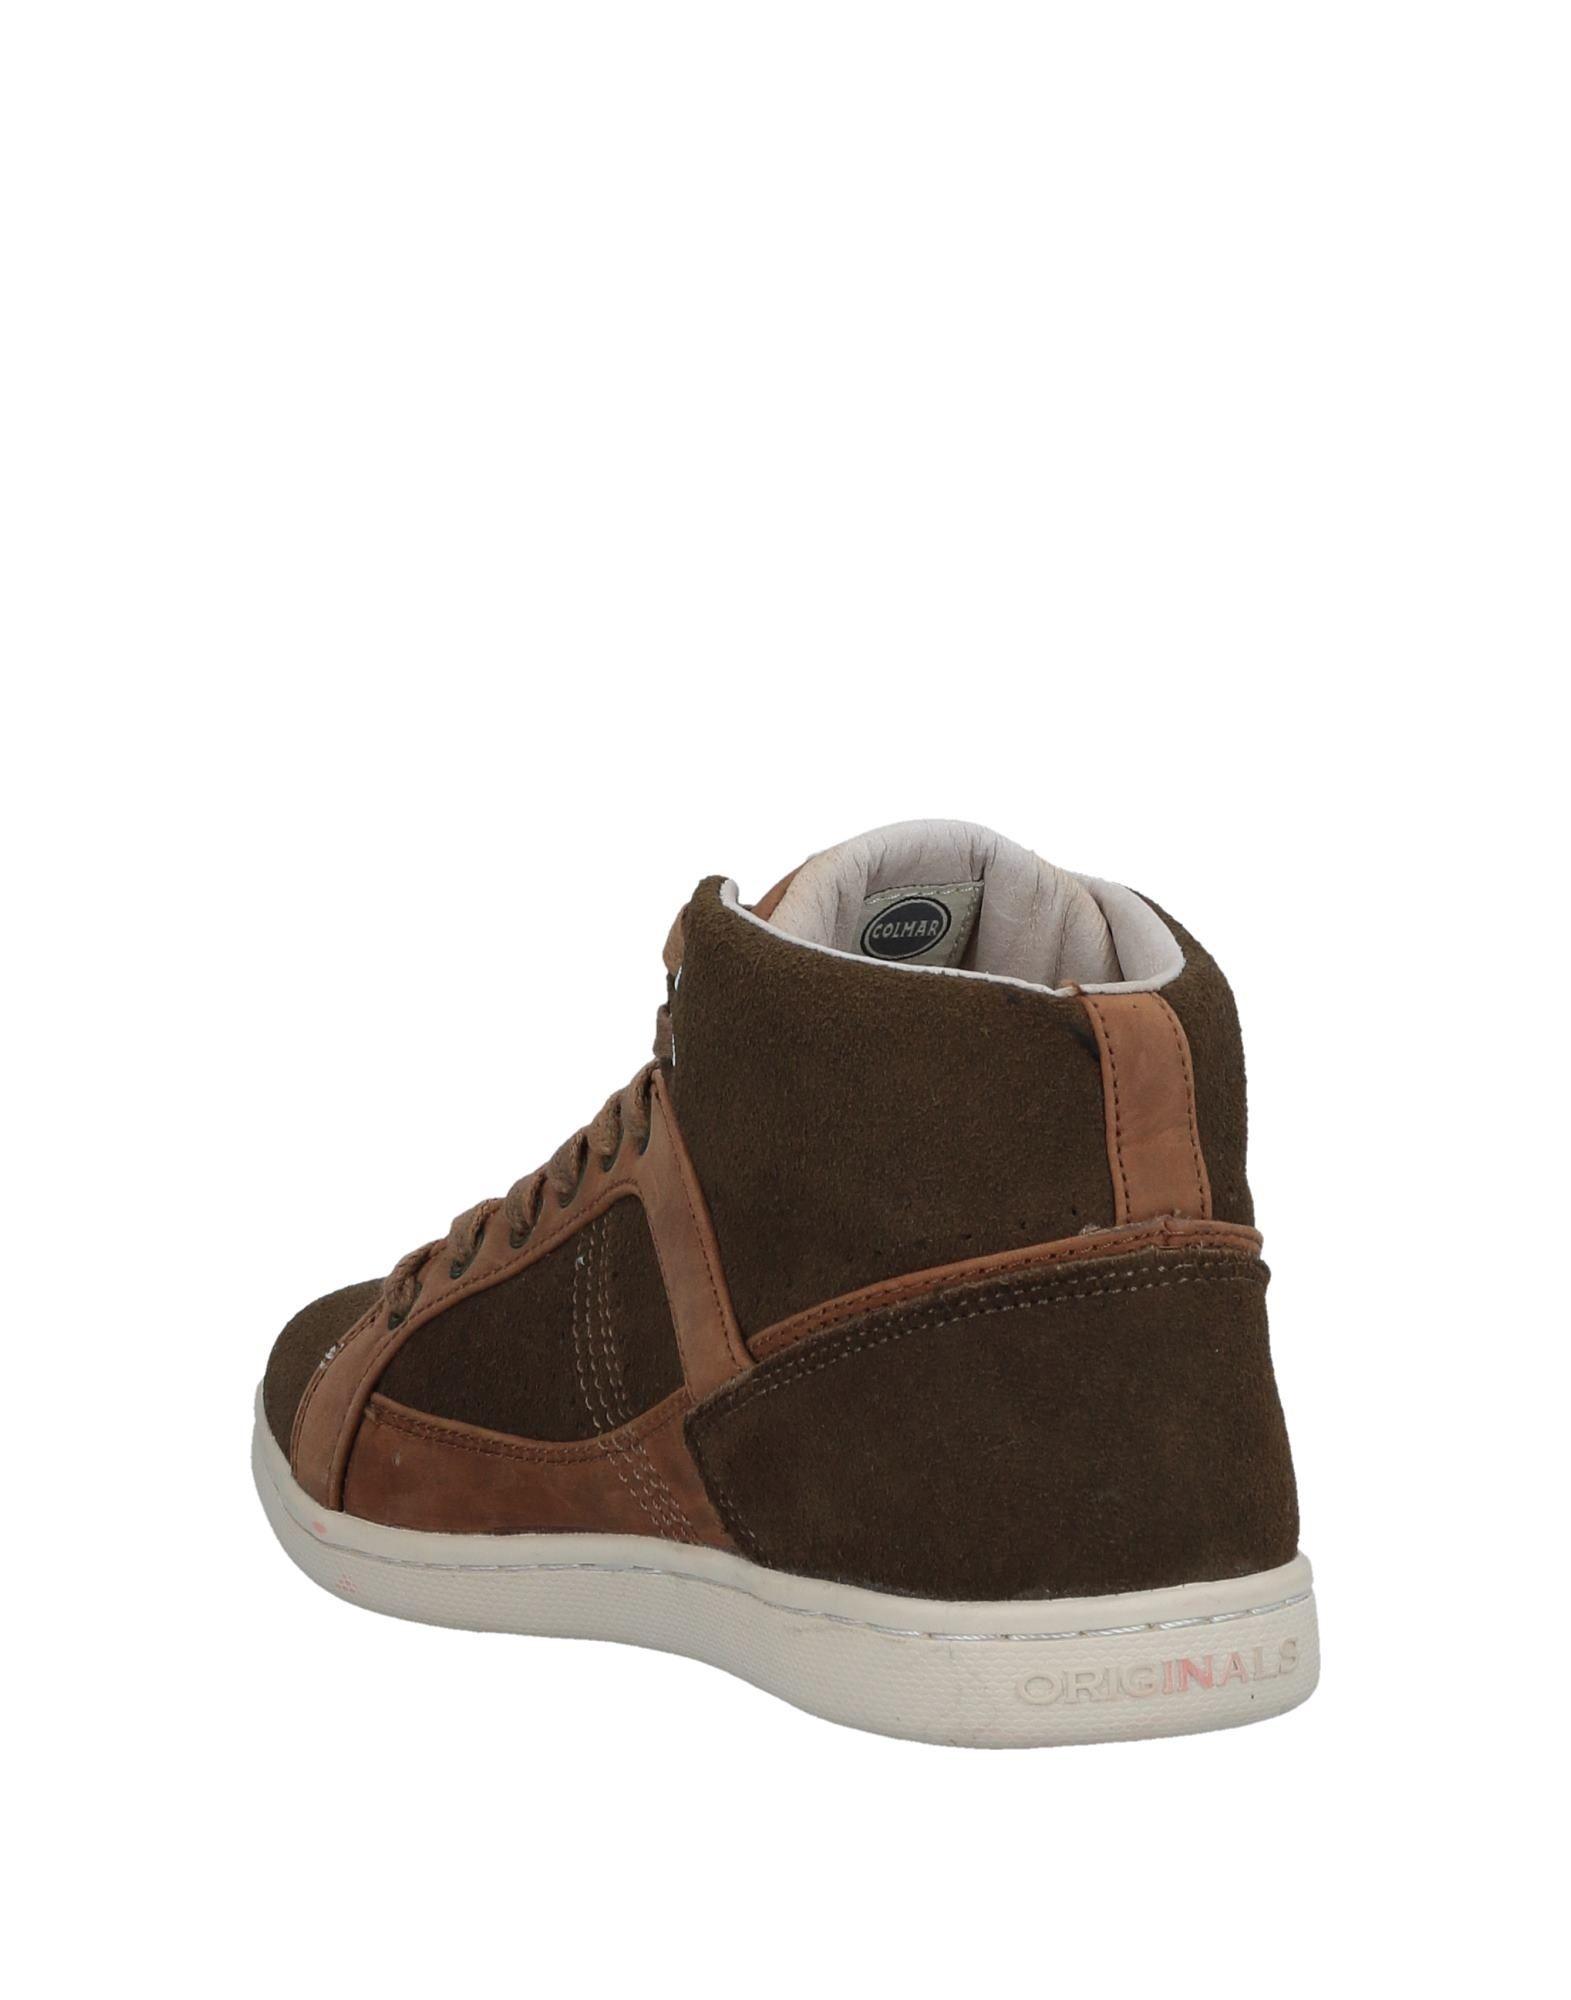 Colmar Sneakers Sneakers Colmar Herren  11525844TR 7c6648